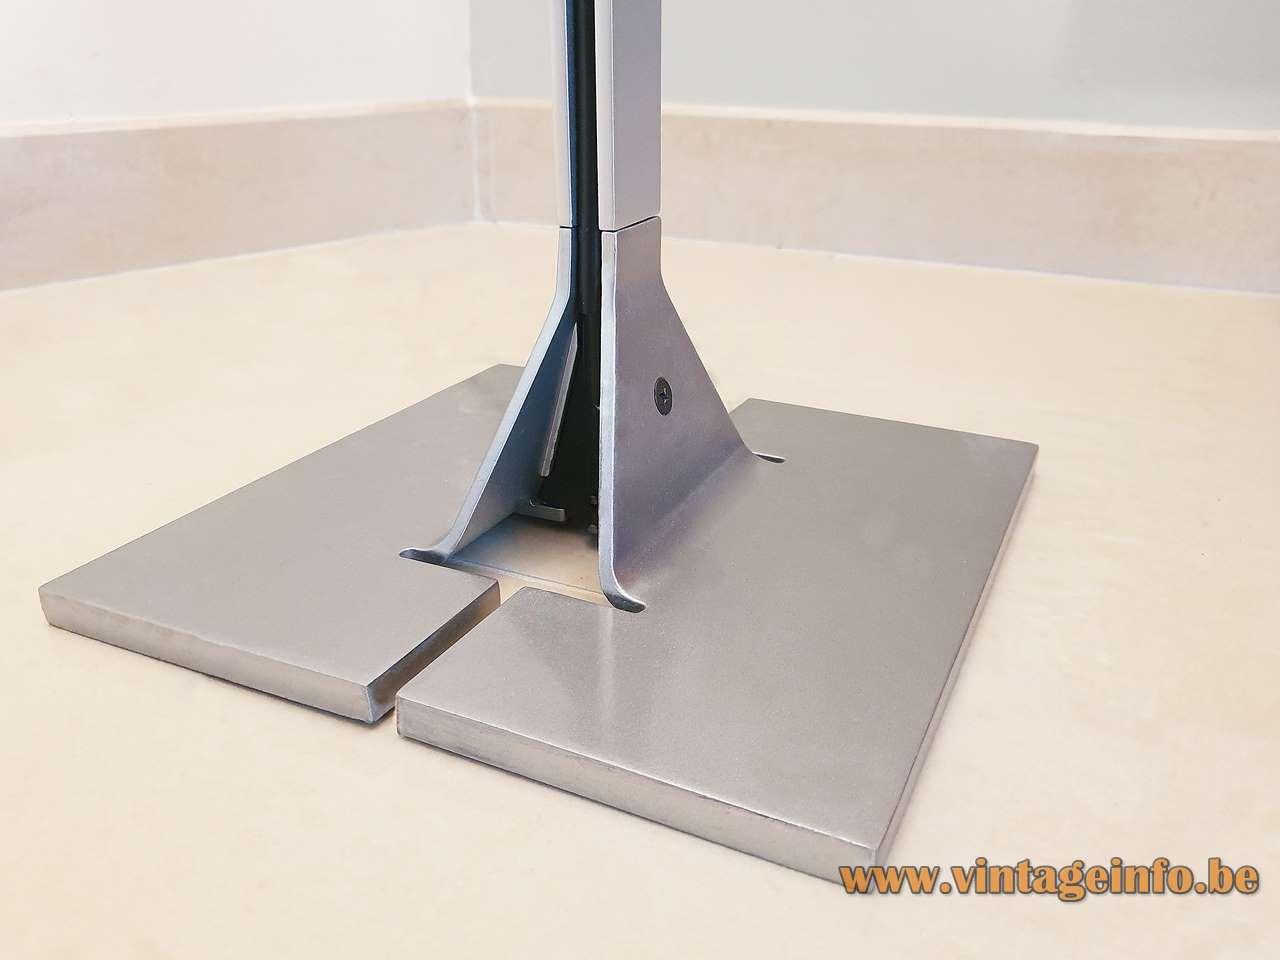 FLOS Papillona floor lamp 1975 design: Tobia Scarpa aluminium rod conical funnel-shaped lampshade 1970s Italy